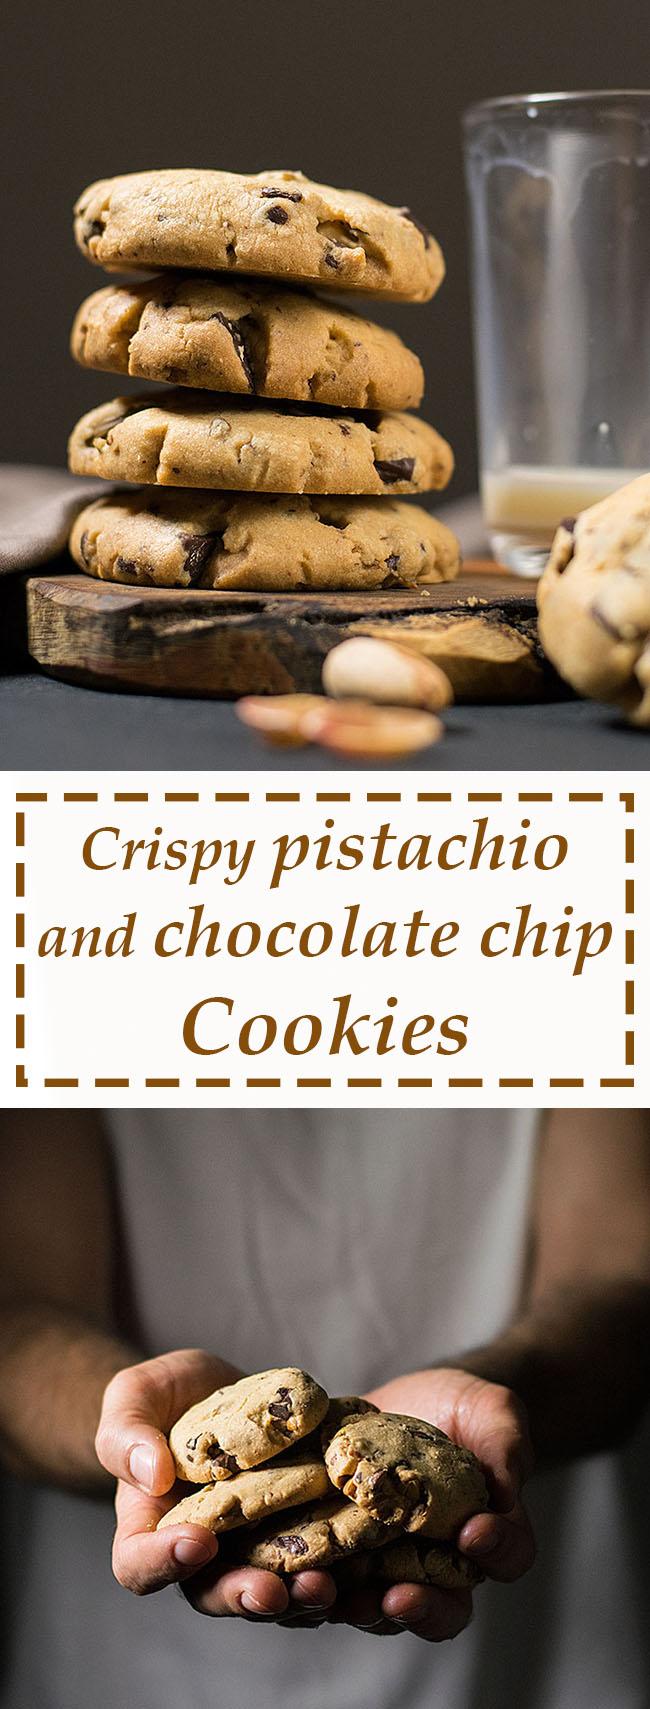 crispy pistachio and chocolate chip cookies 5